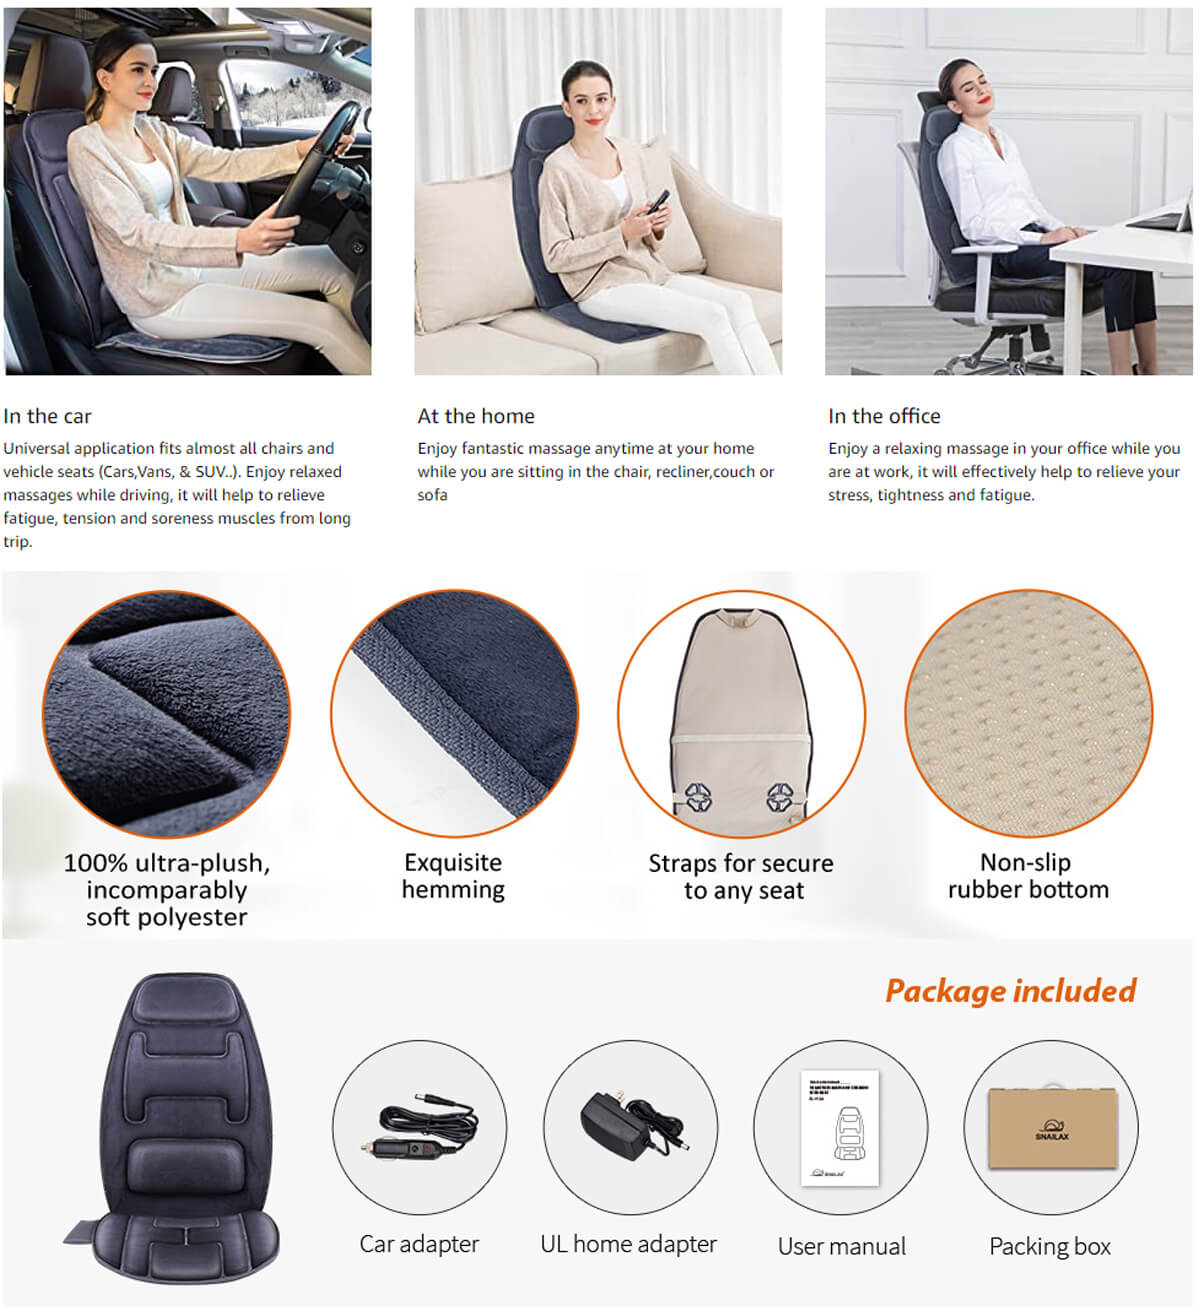 Snailax Massage Seat Cushion Uses